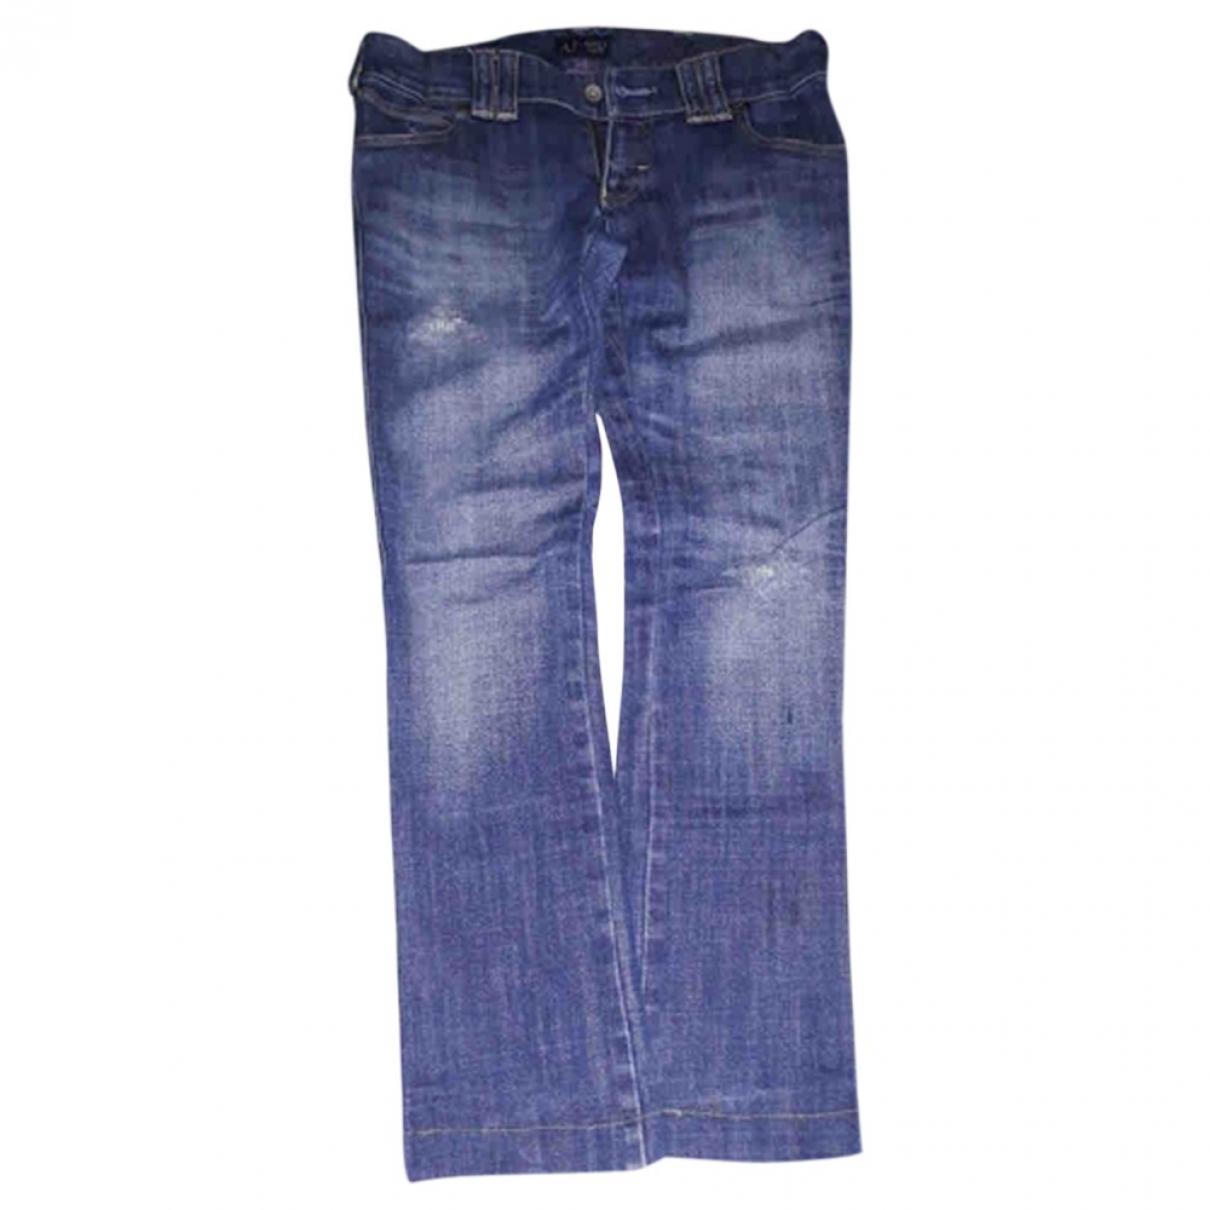 Armani Jeans \N Blue Denim - Jeans Jeans for Women 26 US